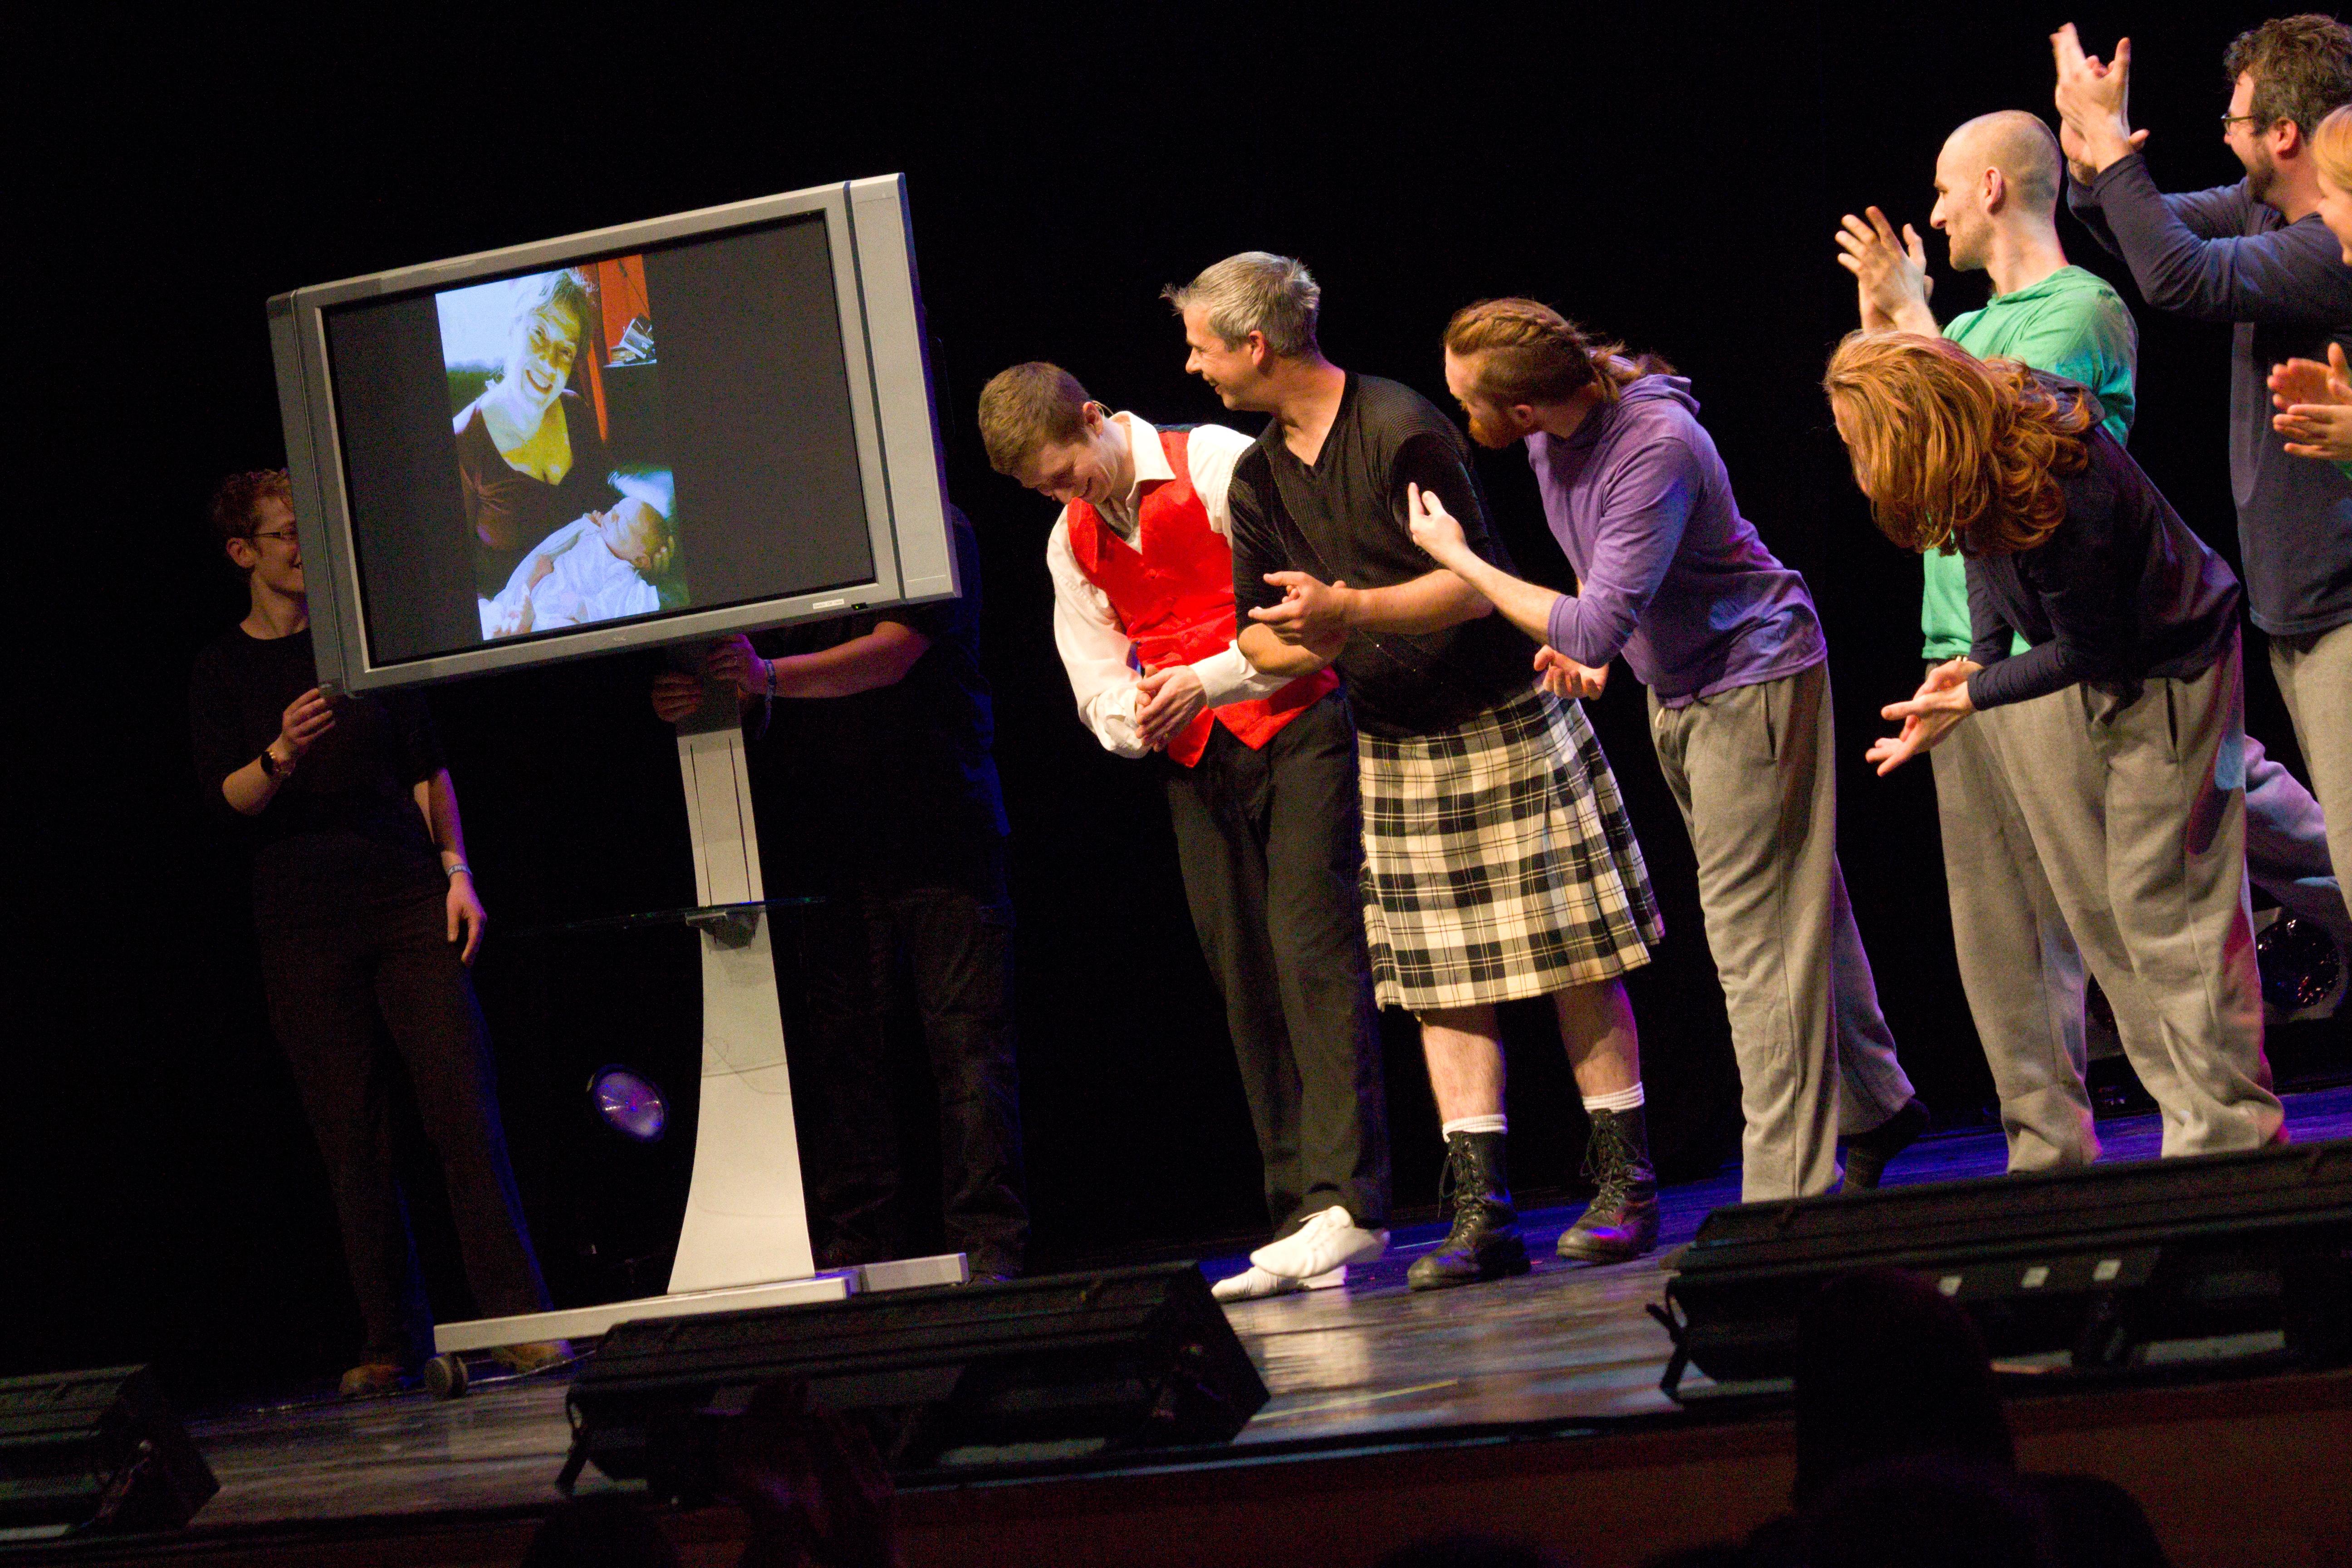 BJC 2016 Perth: BJC 2016 Public Show.